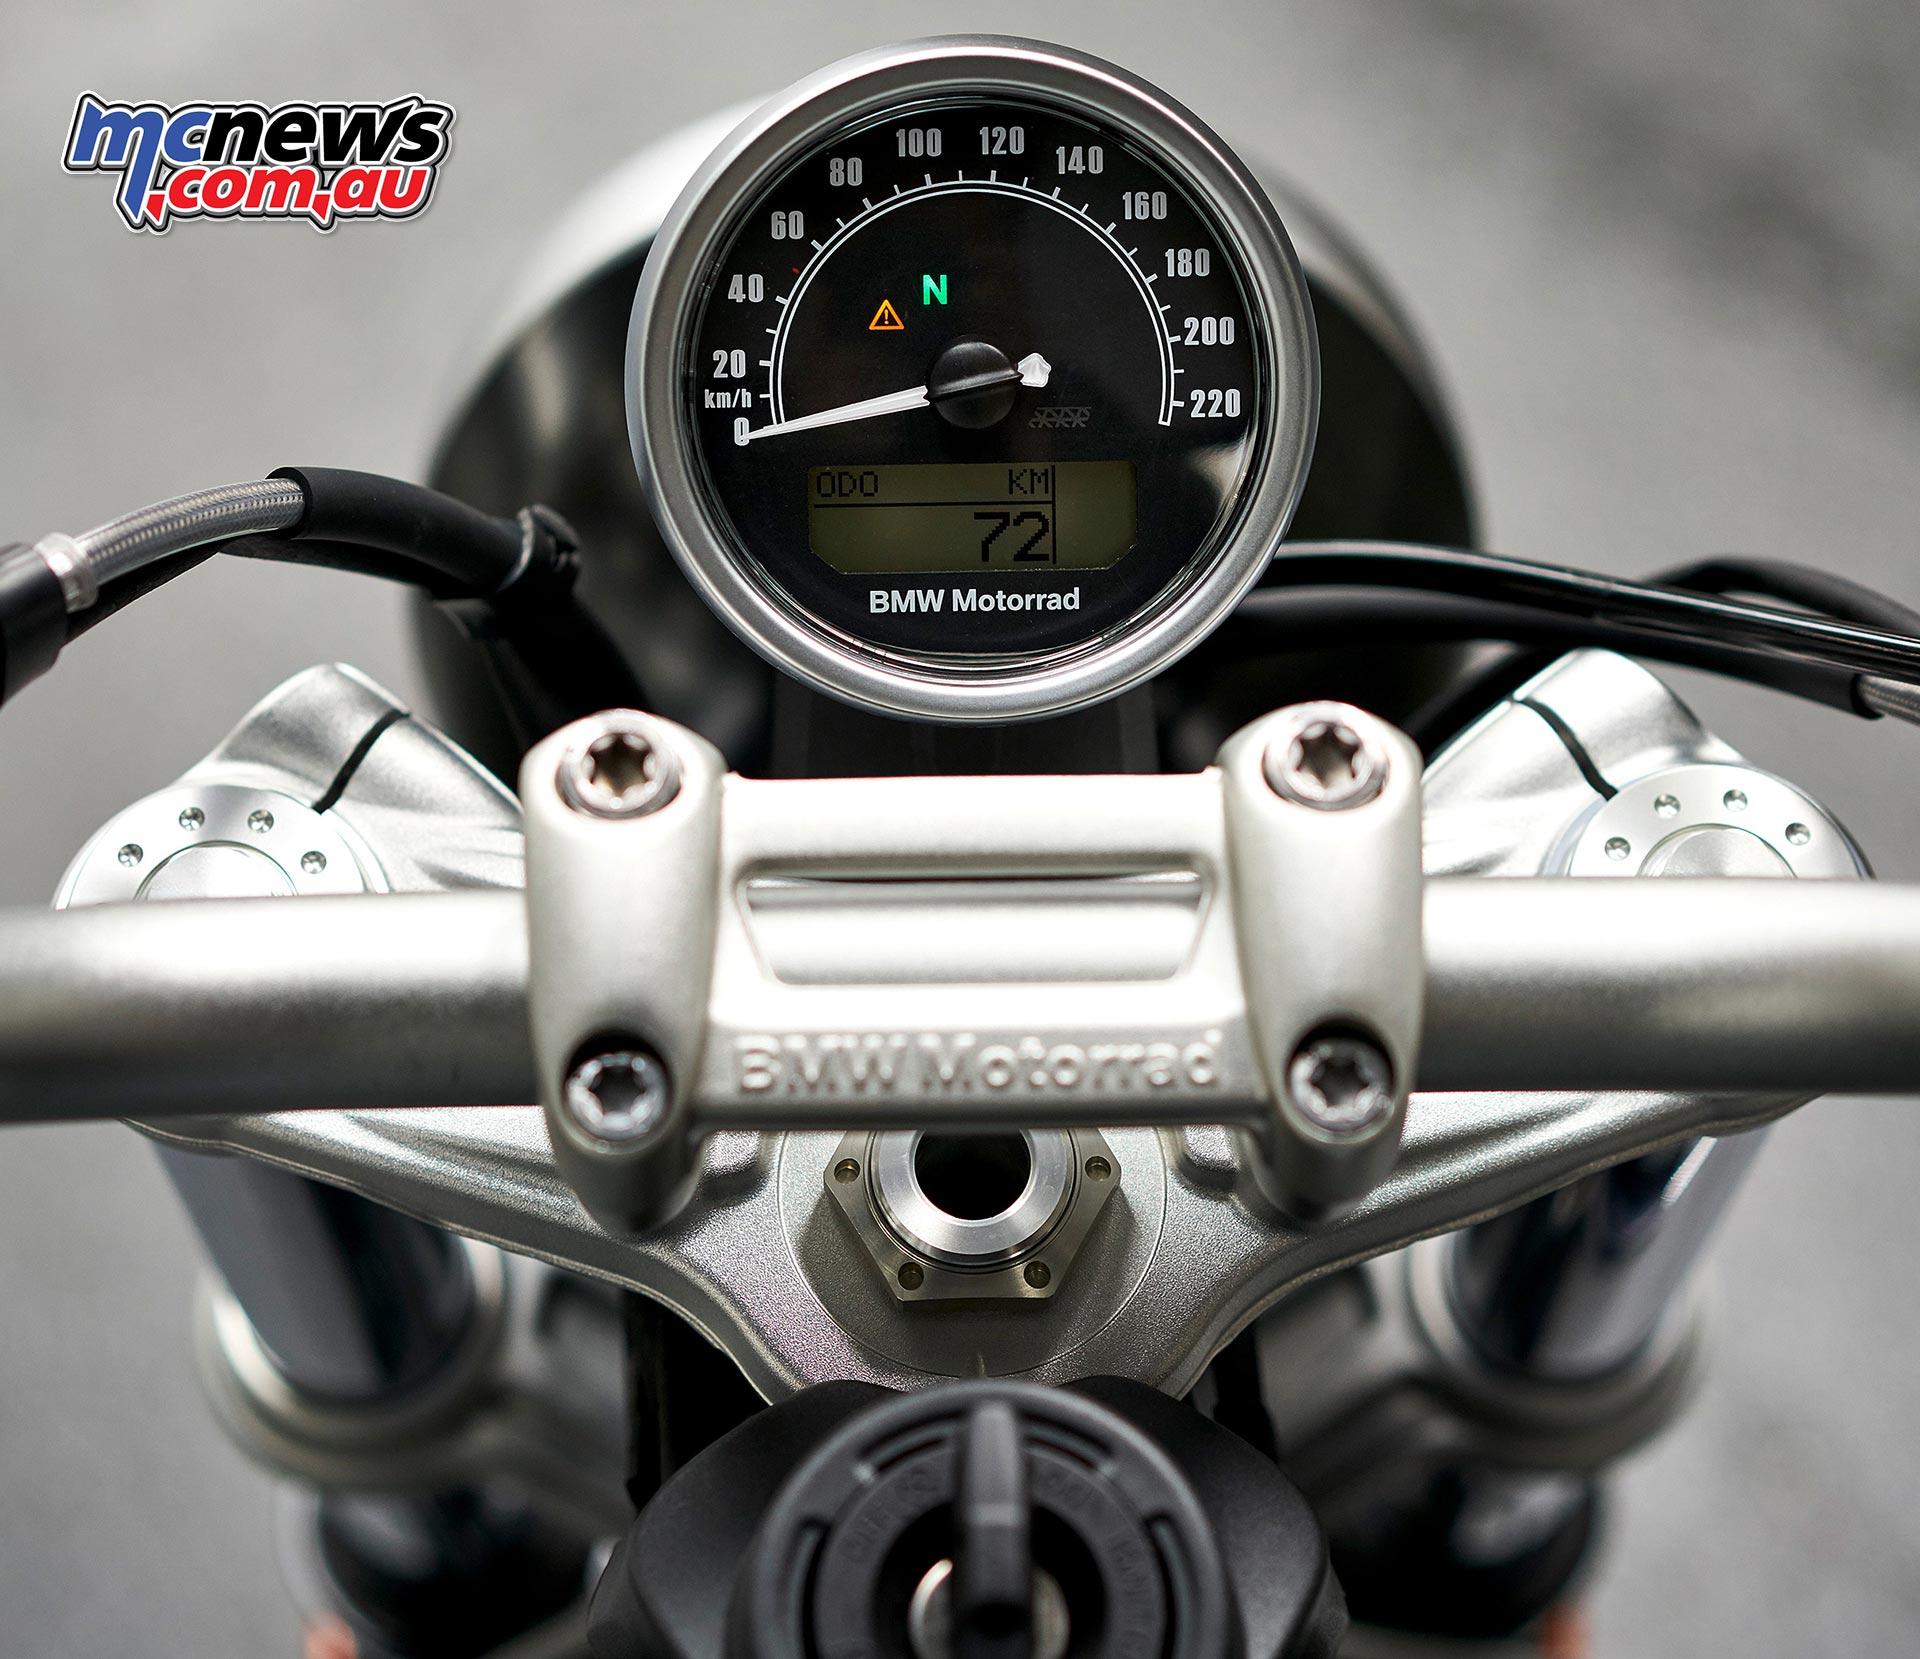 New Bmw R Ninet Racer And R Ninet Pure Mcnews Com Au